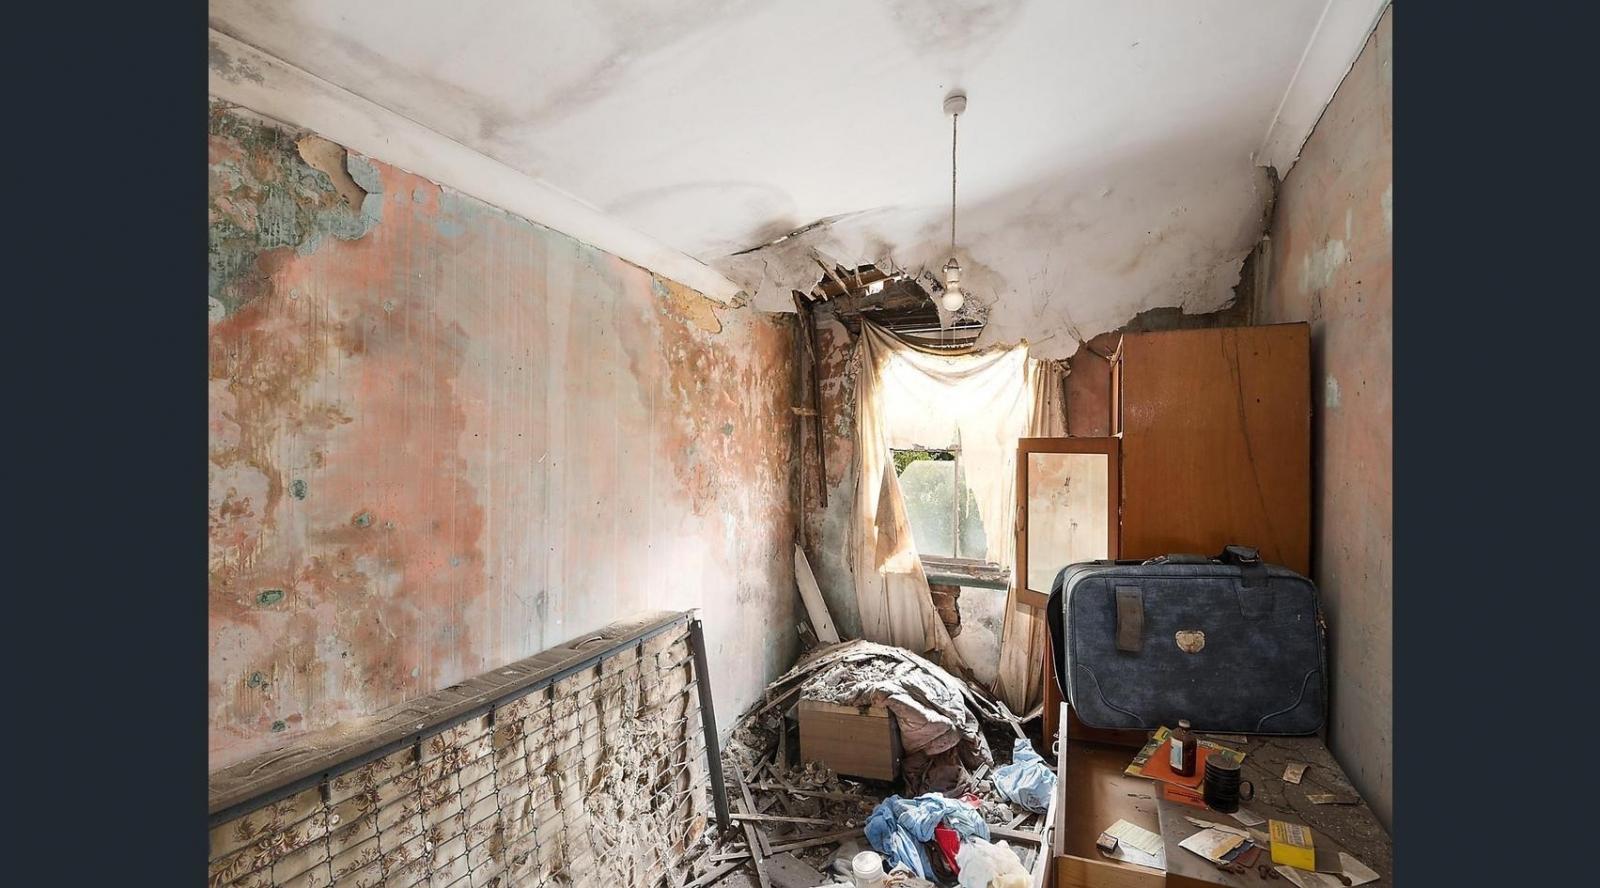 Derelict Sydney house